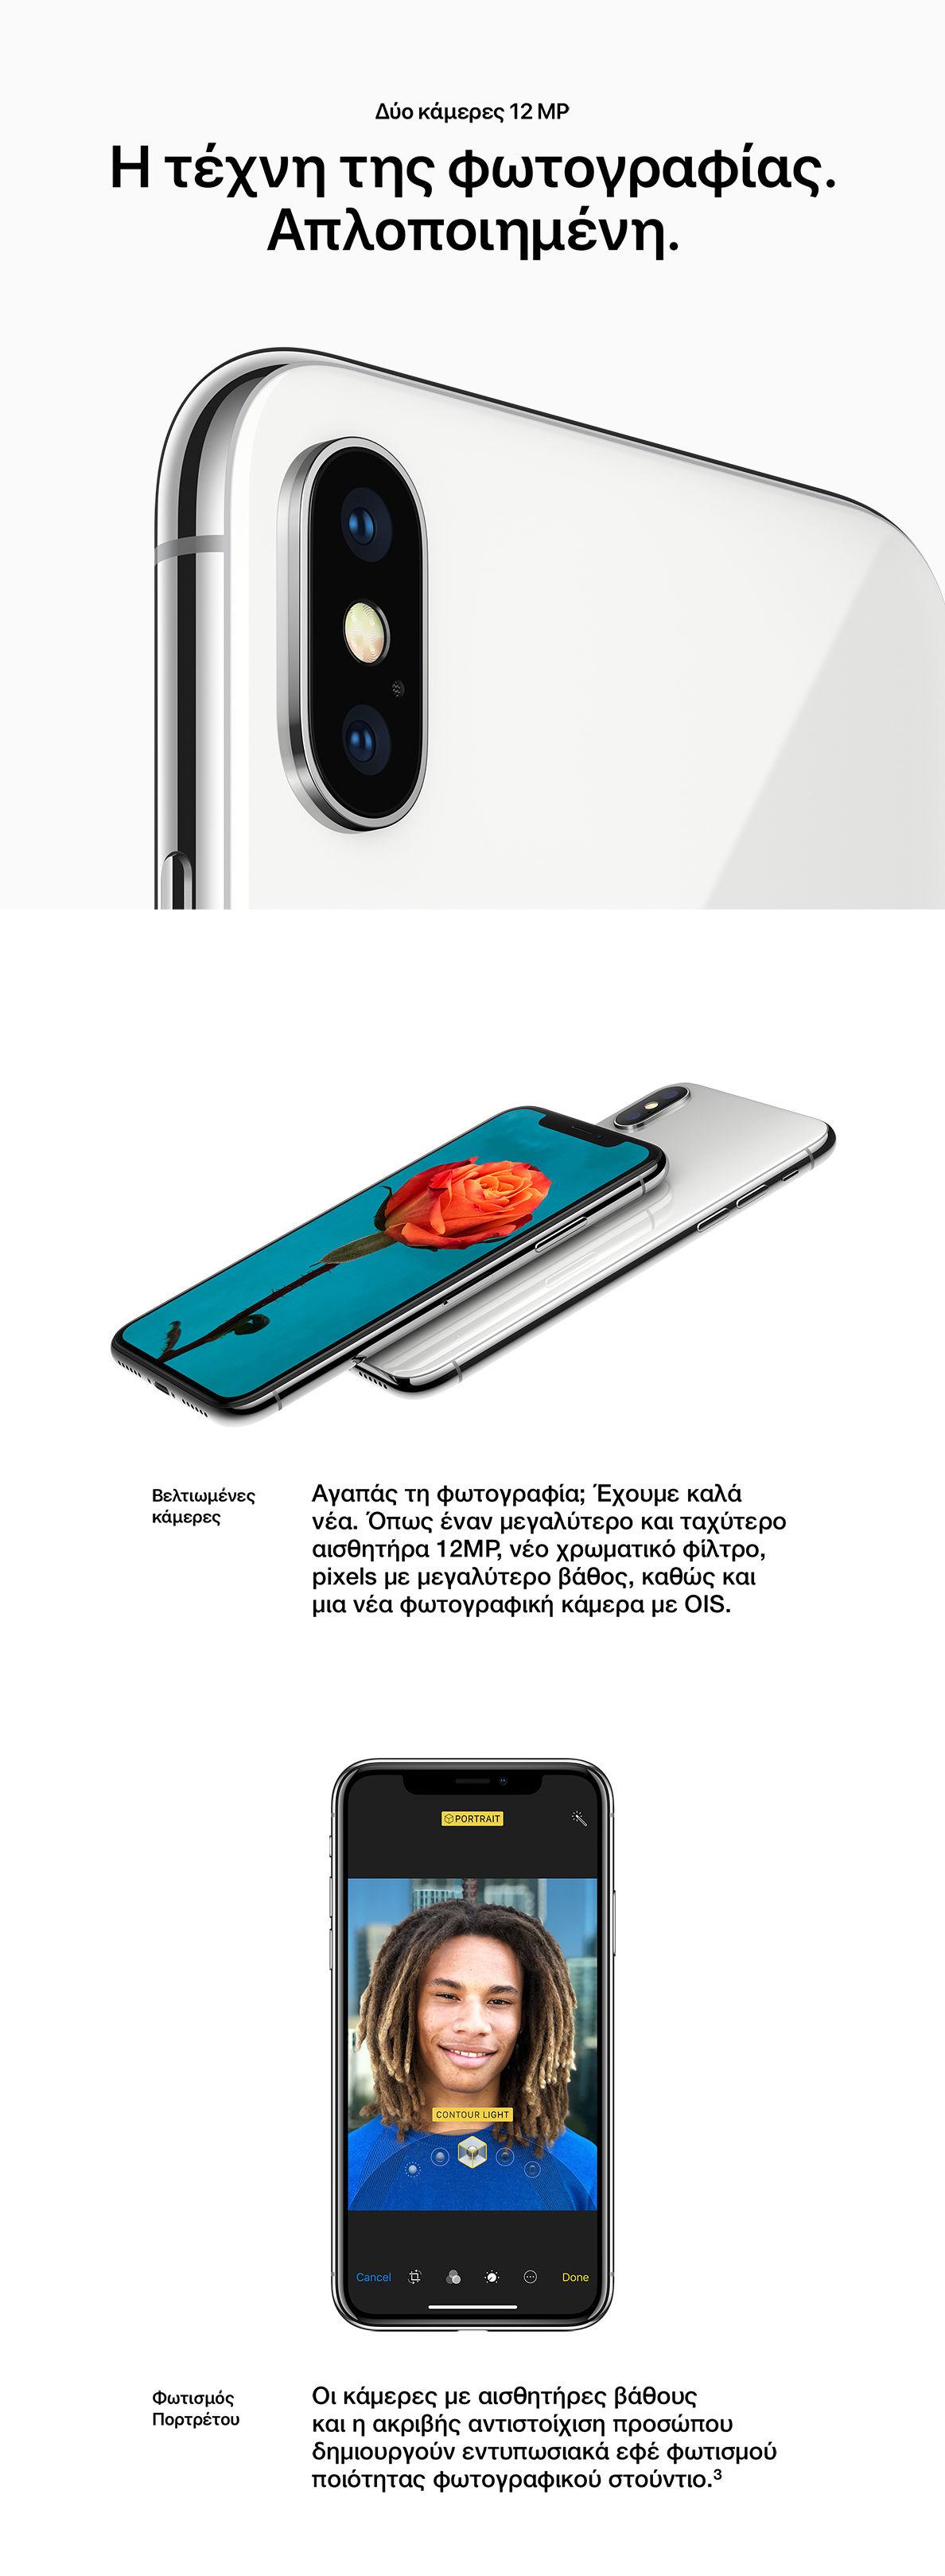 iPhonex-agora-Ellada-Mediamarkt-public-kotsovolos-germanos-iPhoneX-diathesimo-gia-paraggelia-november-2017 (9)